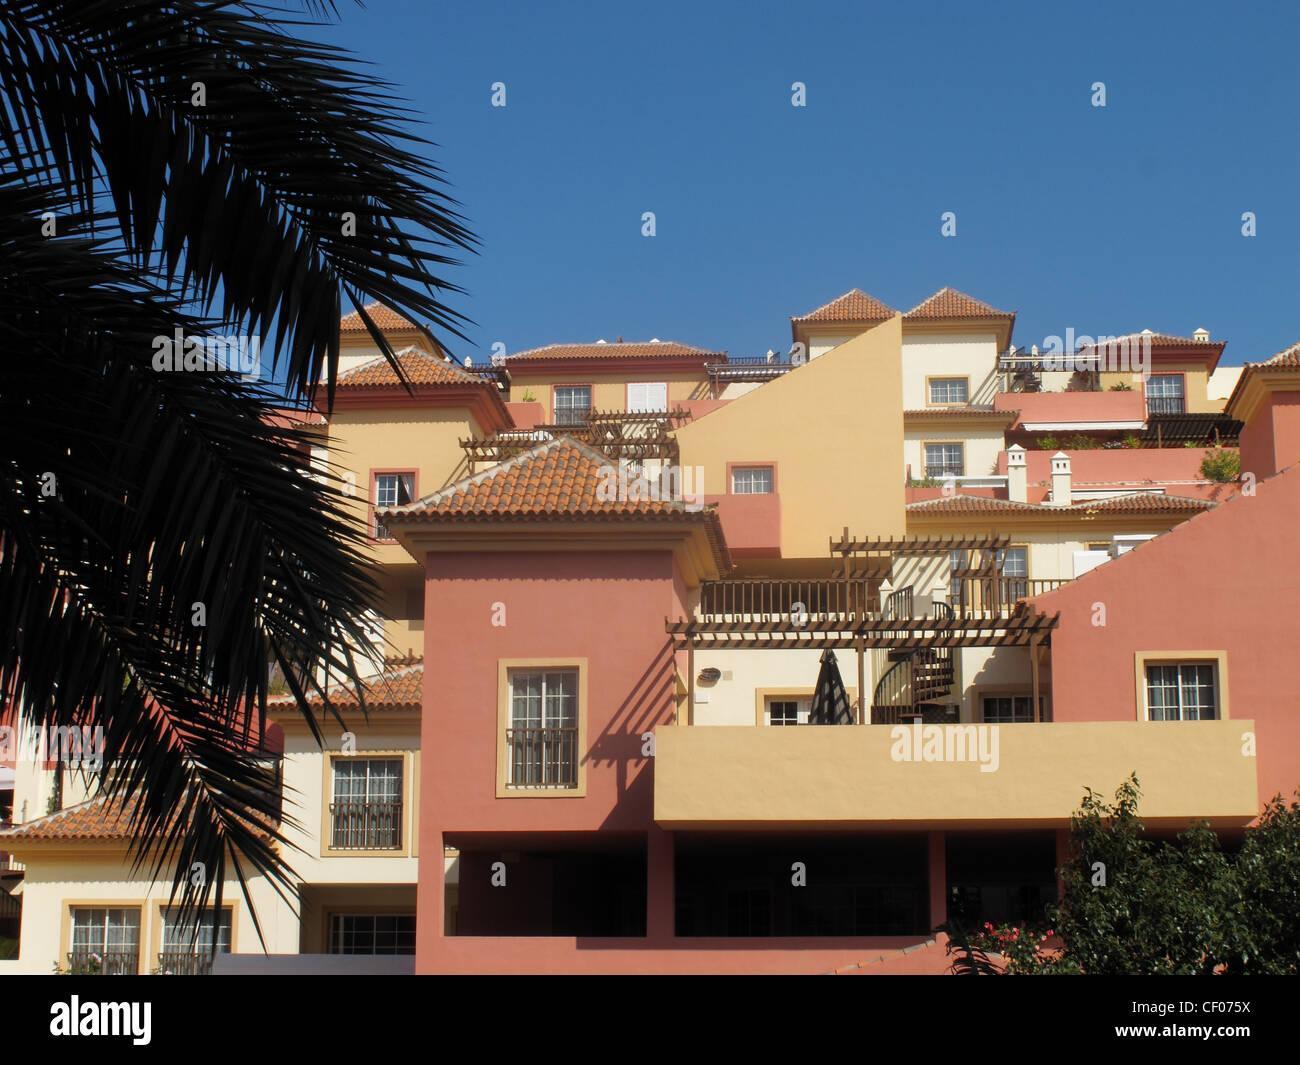 Hell Häusern mit Balkonen in Costa Adeje, Teneriffa, Kanarische Inseln Stockbild